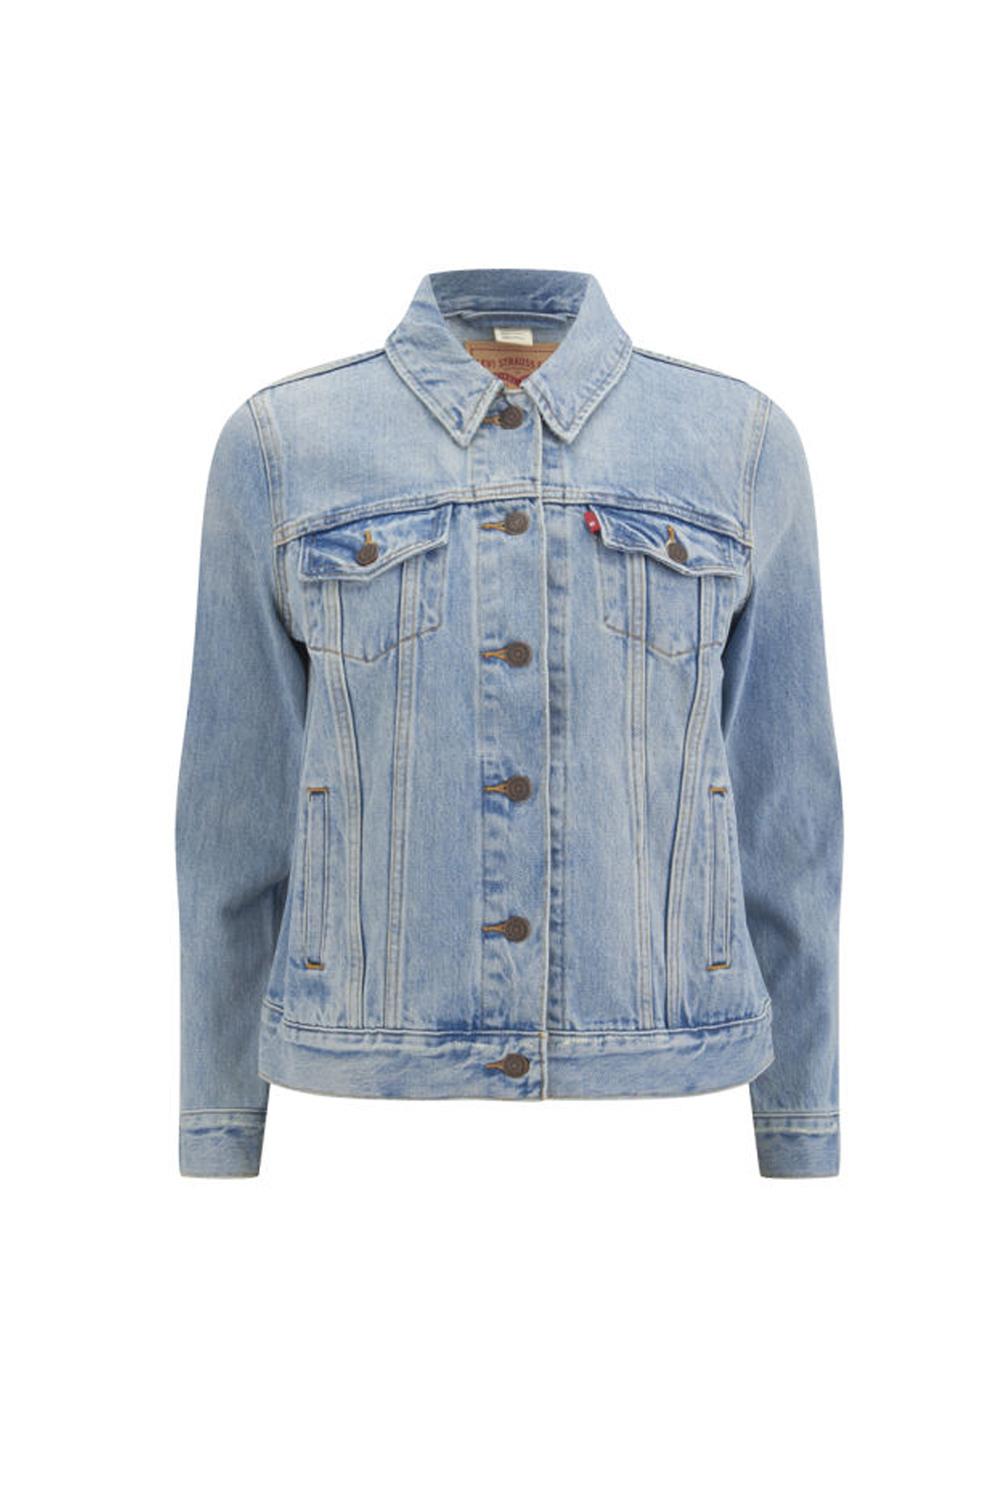 08-spring-denim-trends-shrunken-jackets-03.jpg